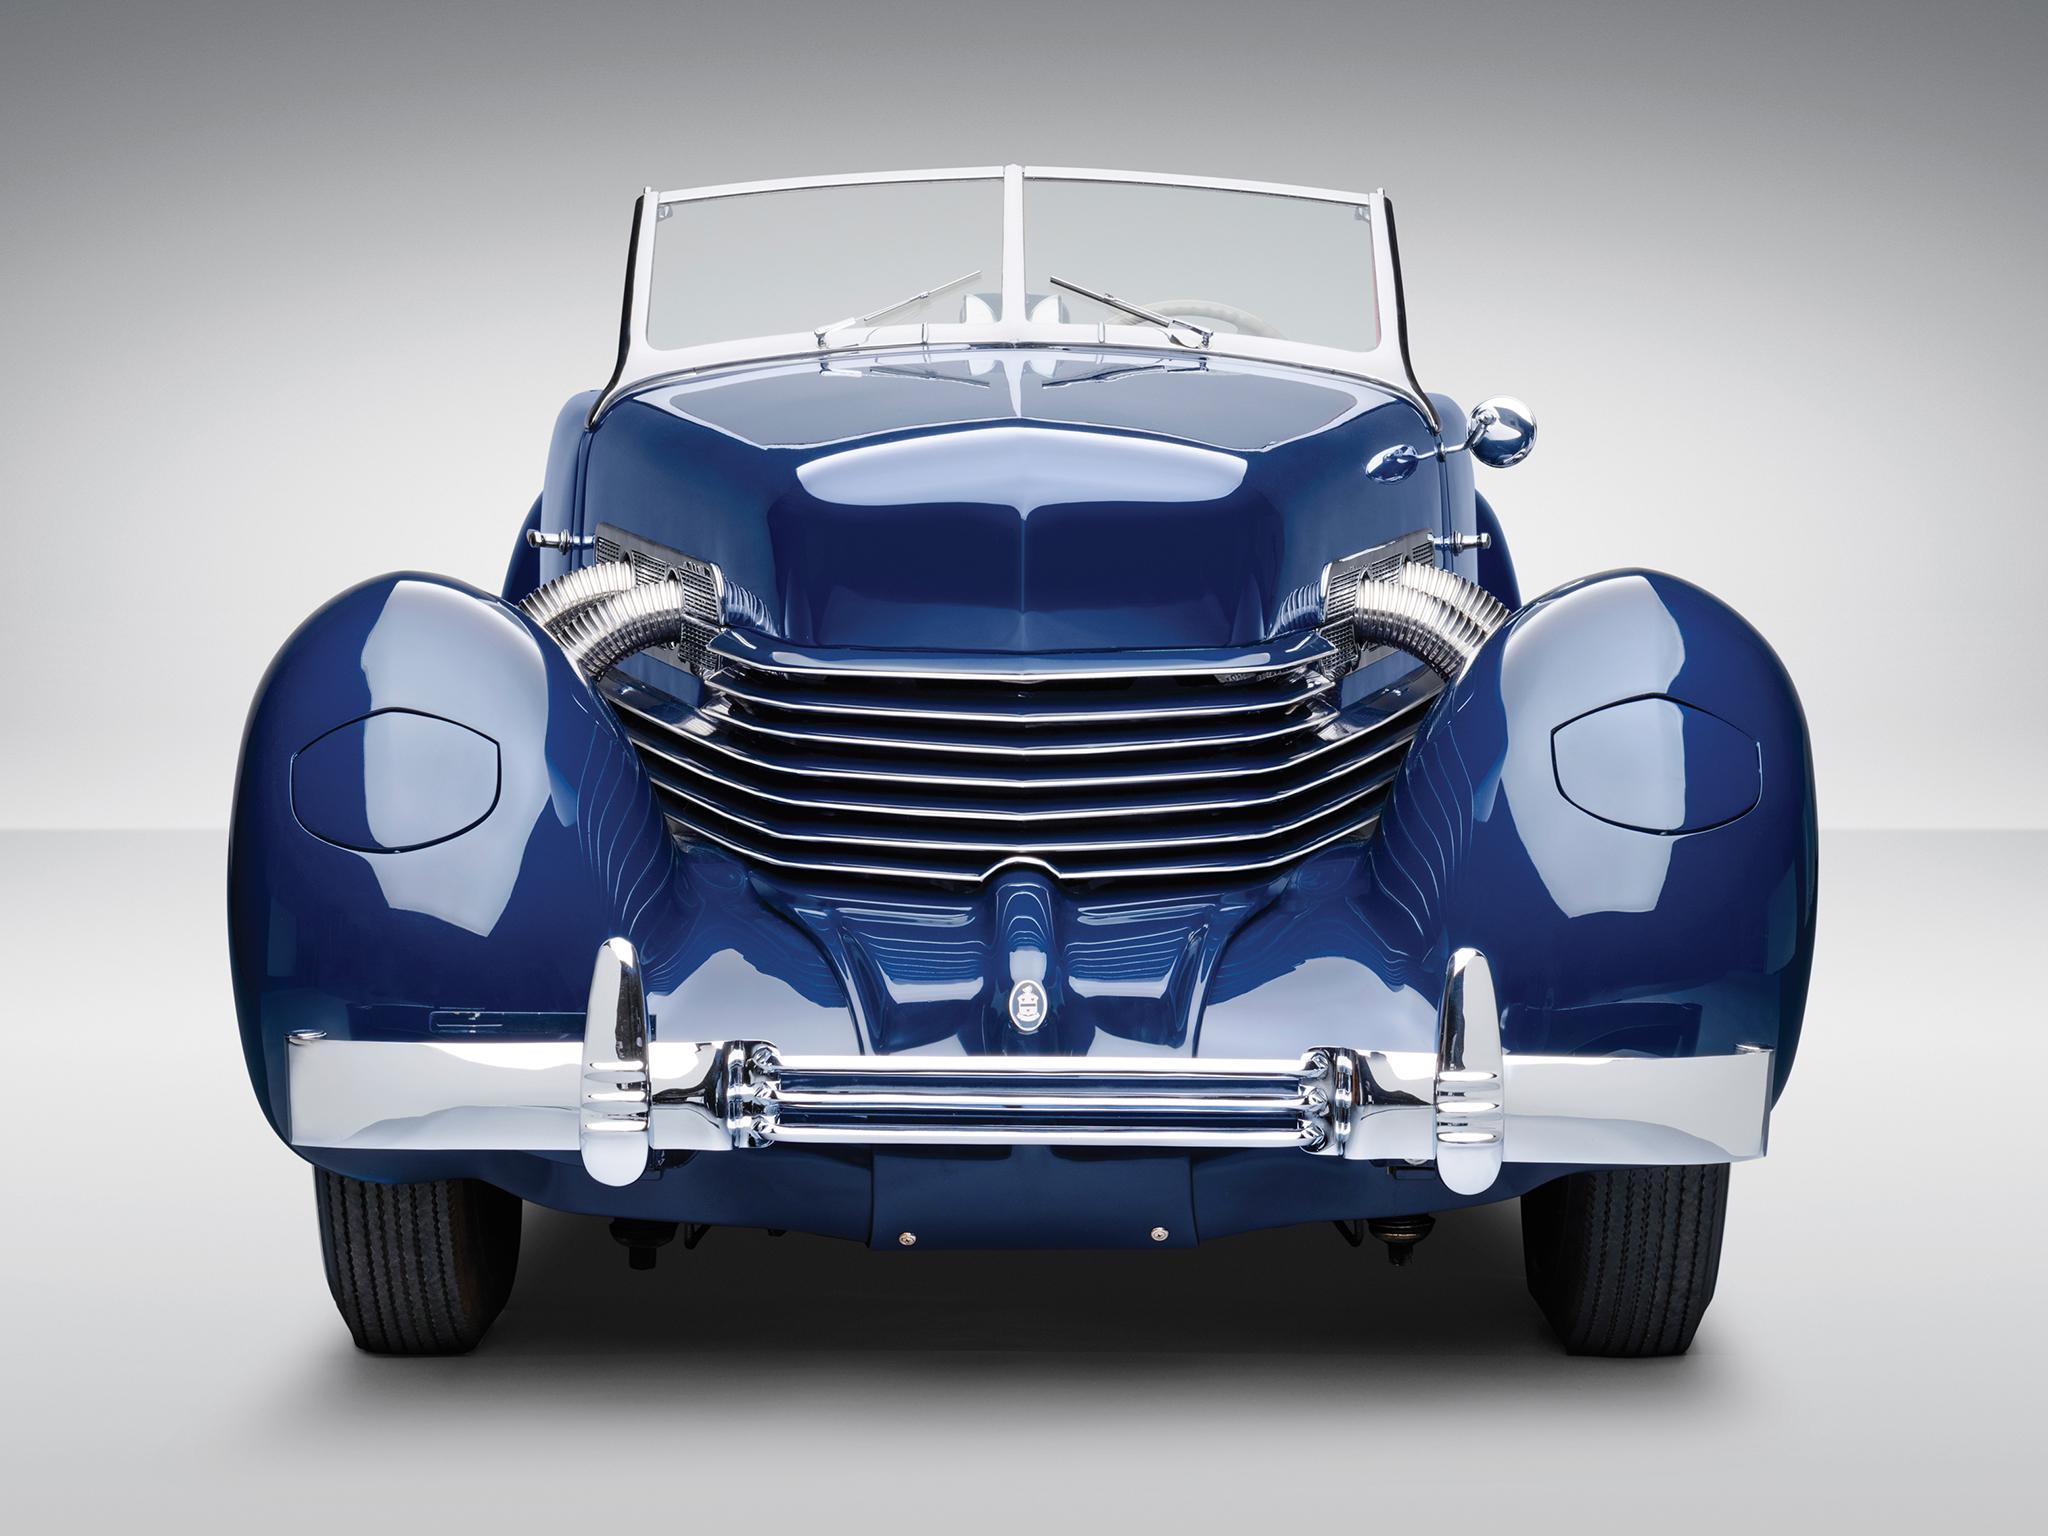 1937 Cord 812 S-C Phaeton retro roadster wallpaper background